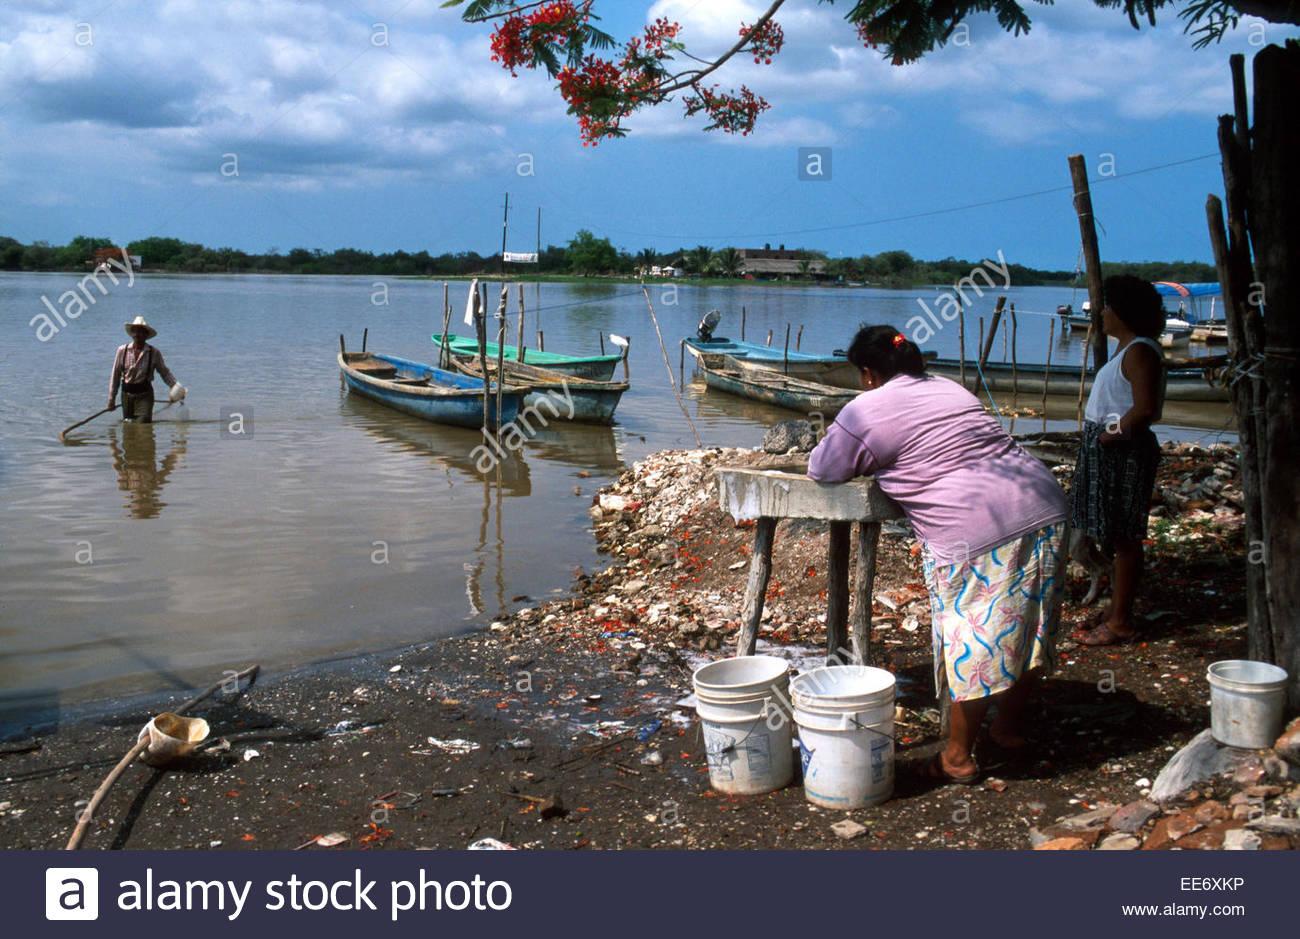 Mexcaltitan, Clothes washing in the lagoon Stock Photo